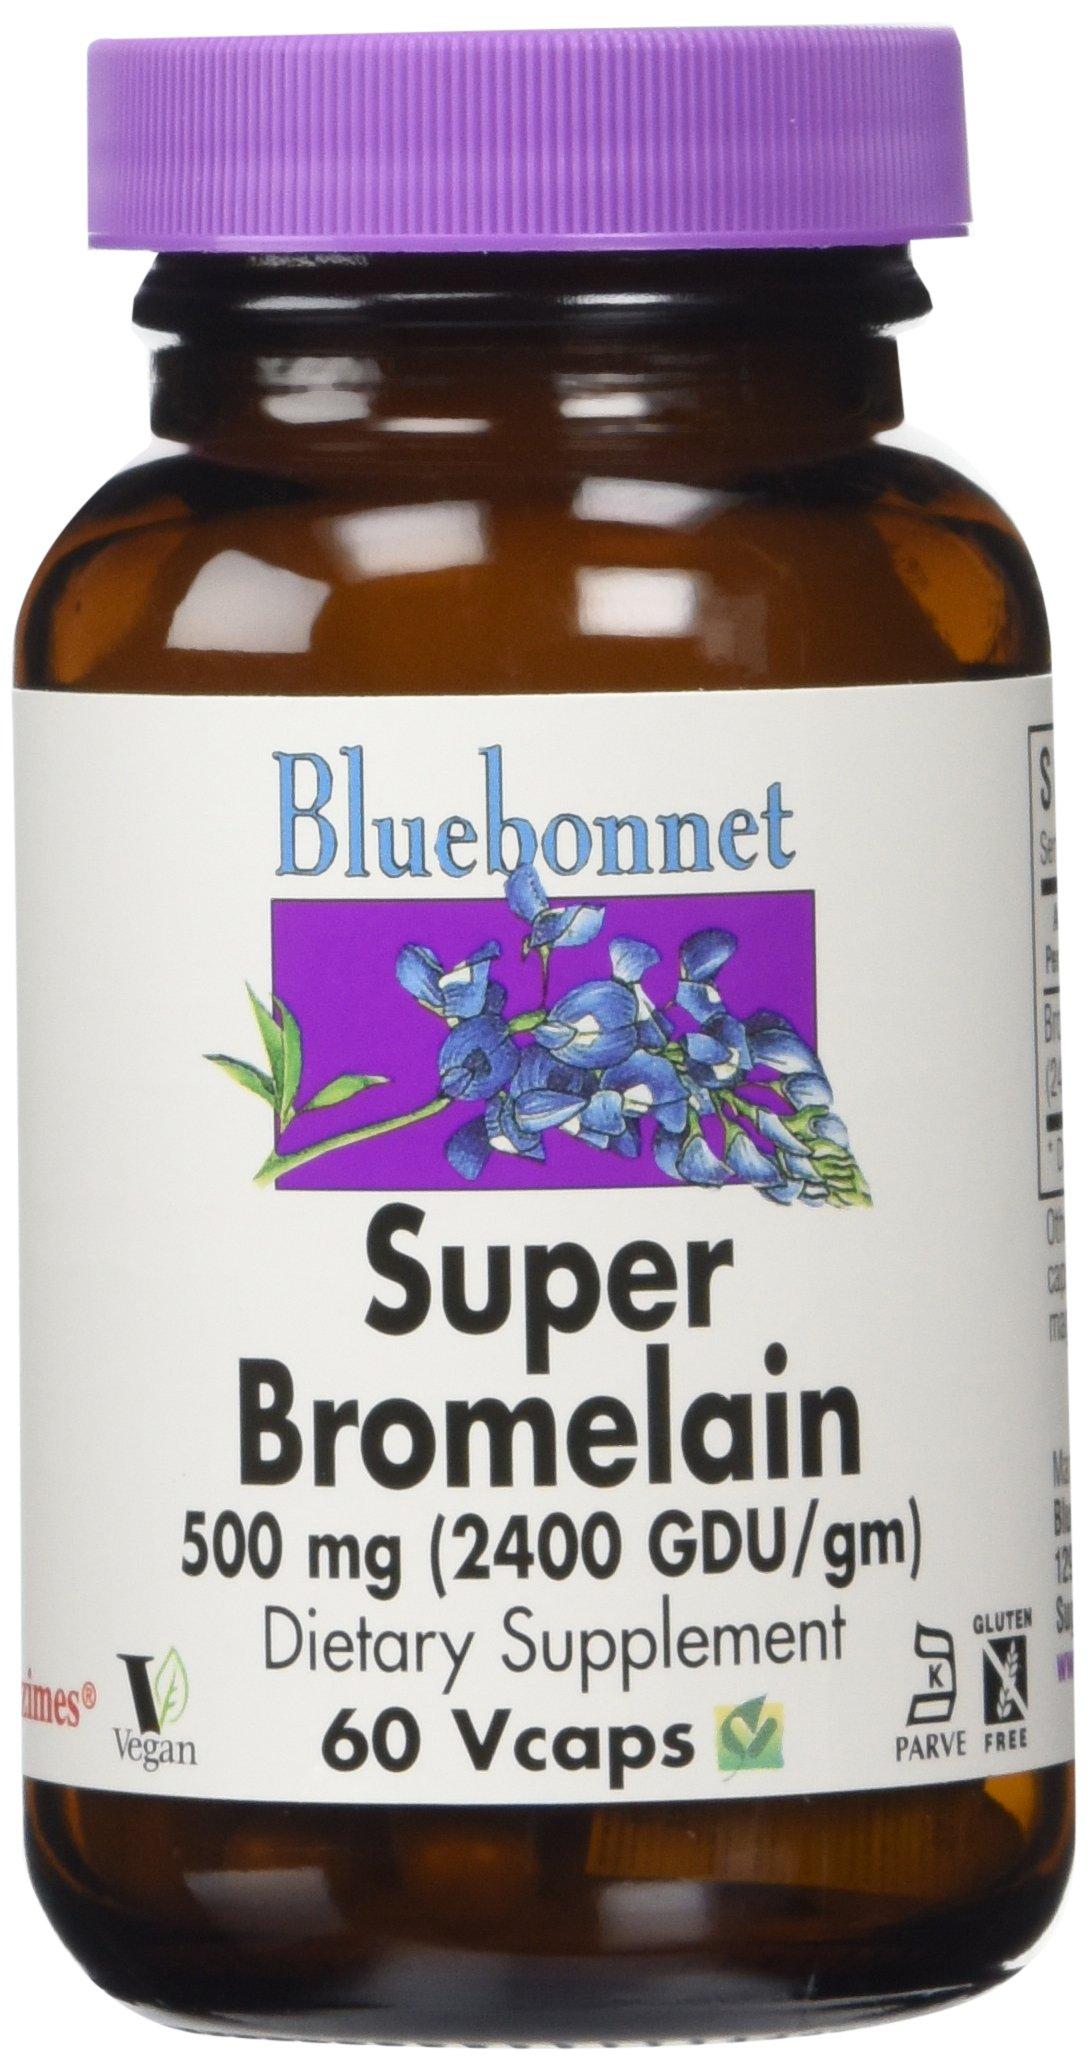 Bluebonnet - Super Bromelain 500 mg - 60 Veg Caps